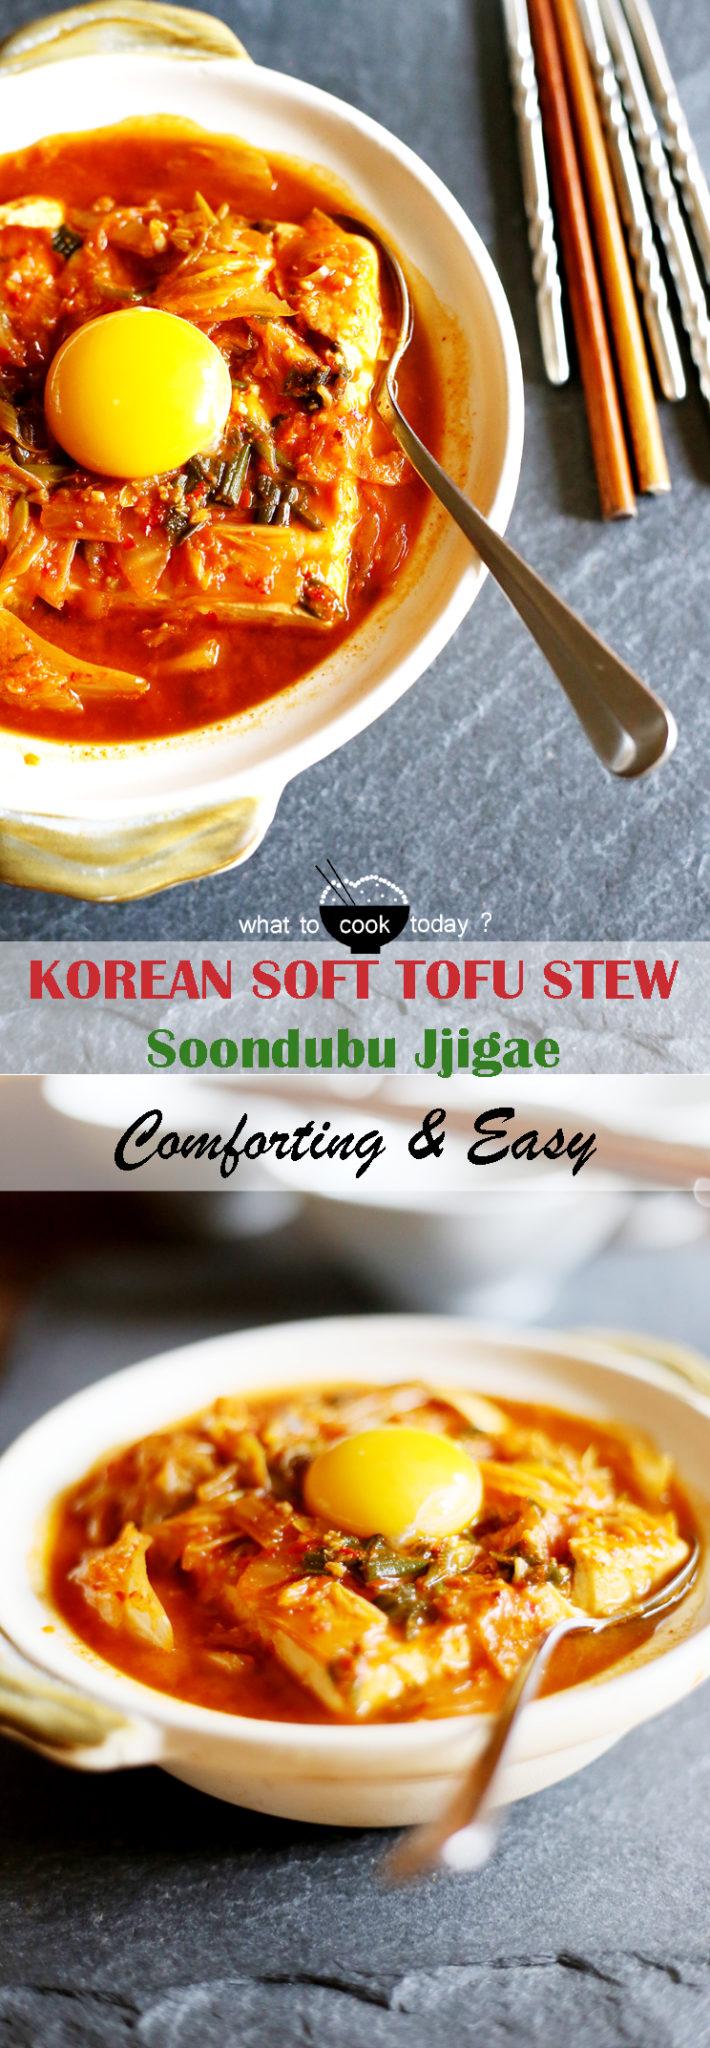 Korean soft tofu with kimchi stew (Soondubu Jjigae).